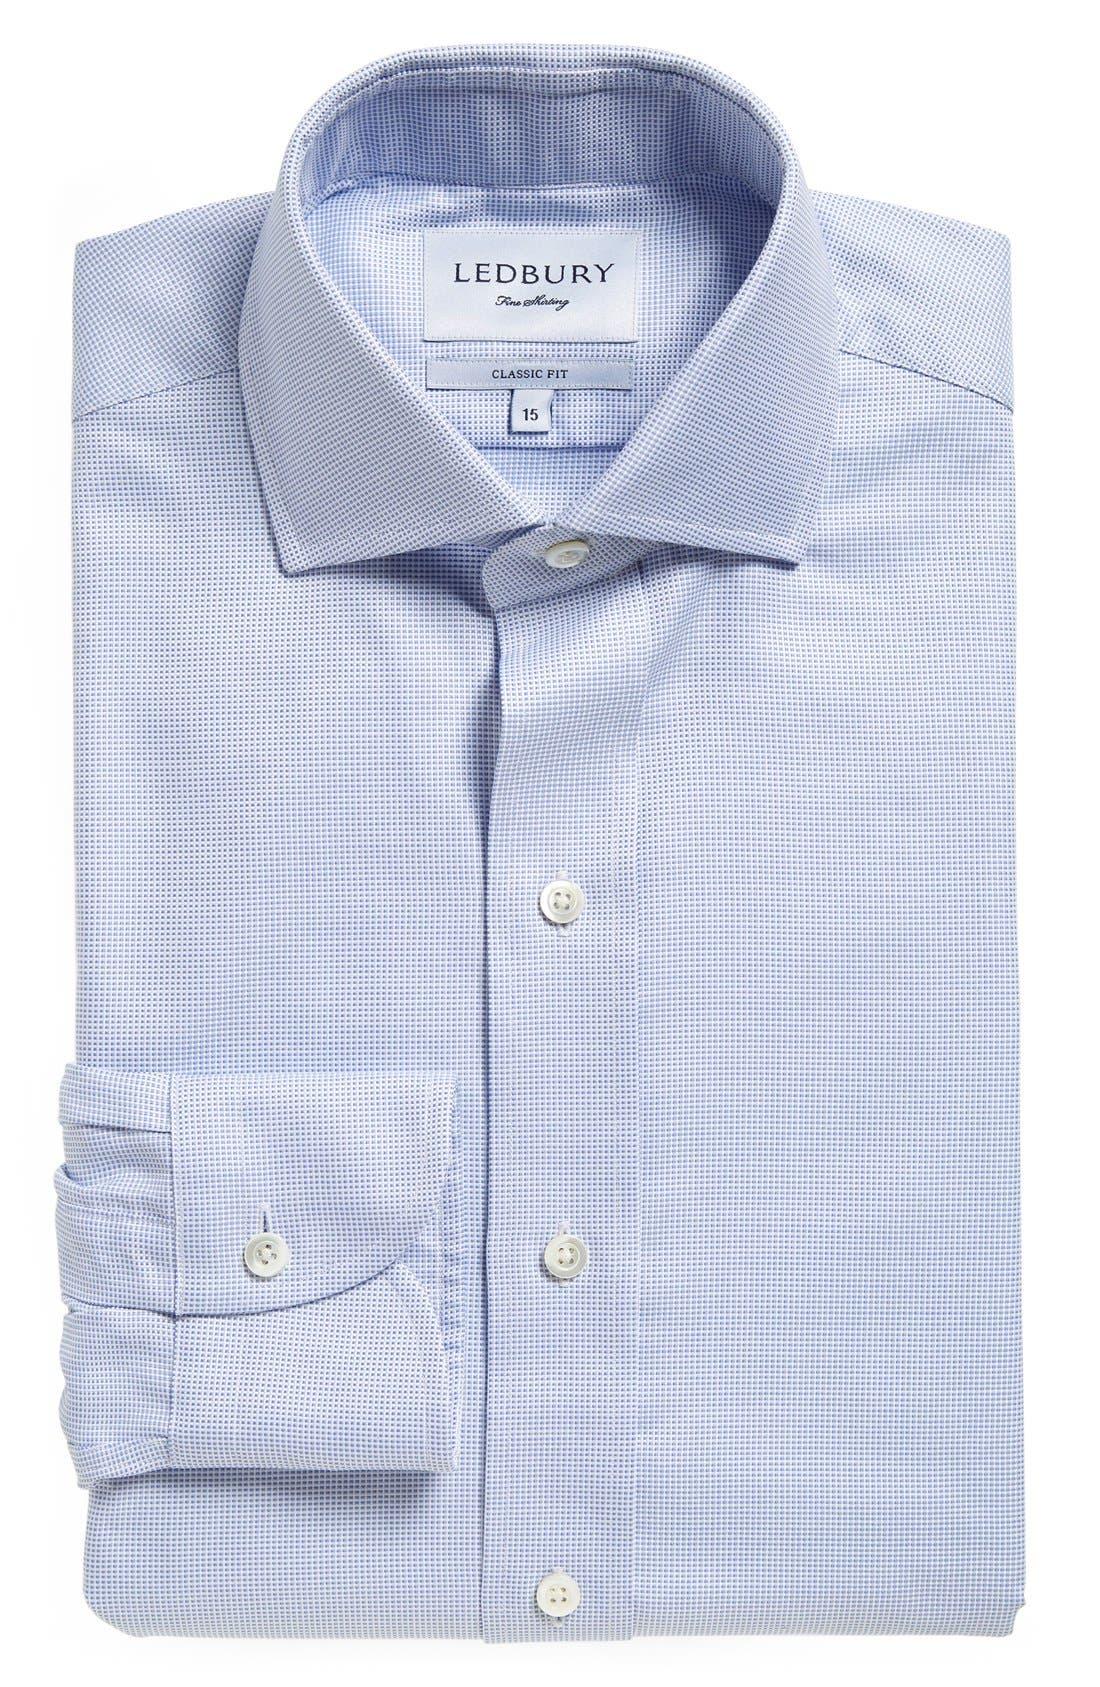 Ledbury Classic Fit Check Dress Shirt